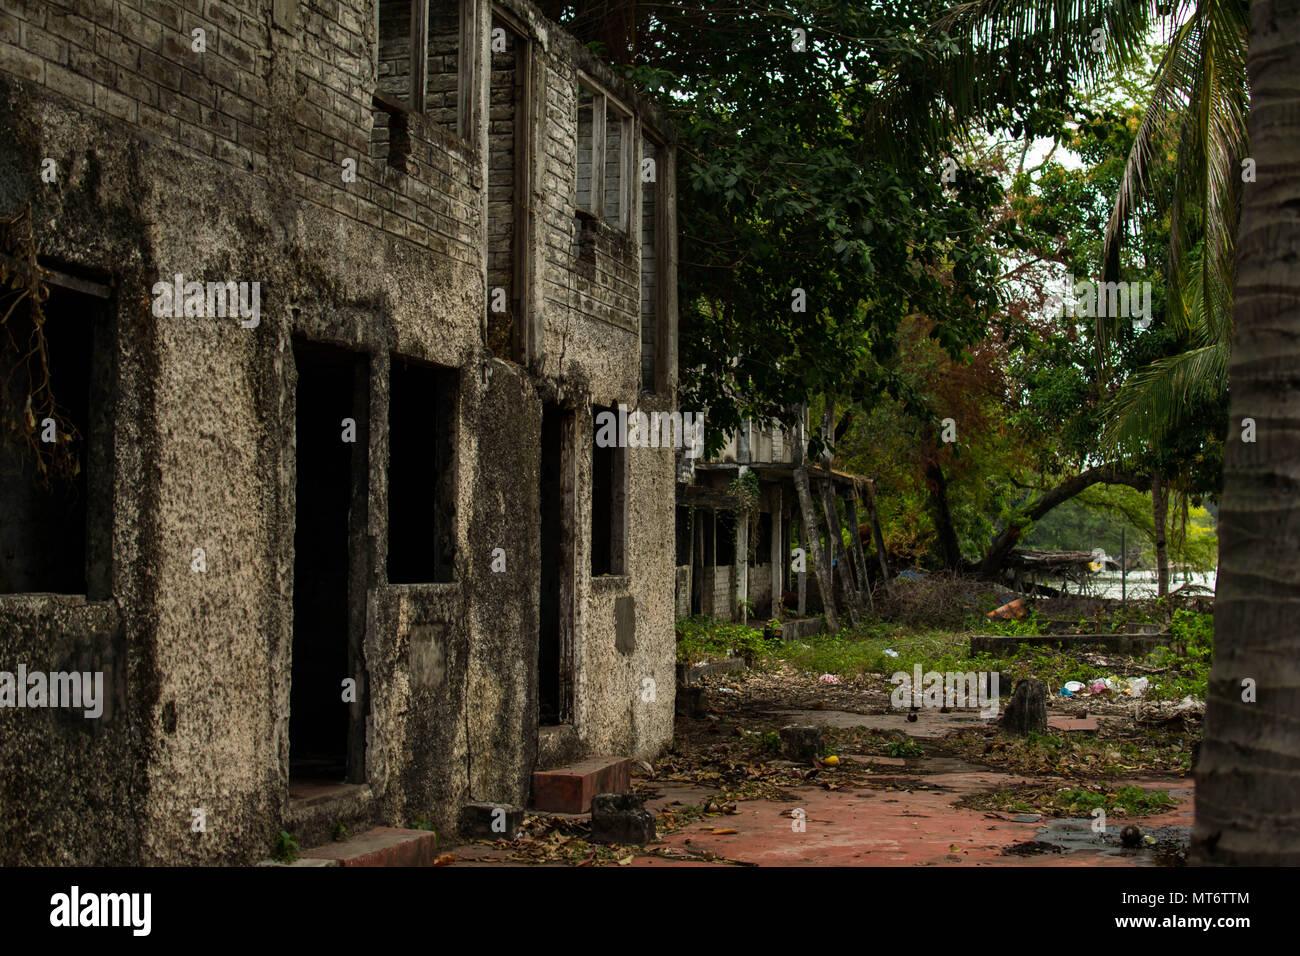 Myogalpa, Nicaragua. February 3, 2018. Abandoned and decrepit homes in Myogalpa, the biggest town on Ometepe Island - Stock Image